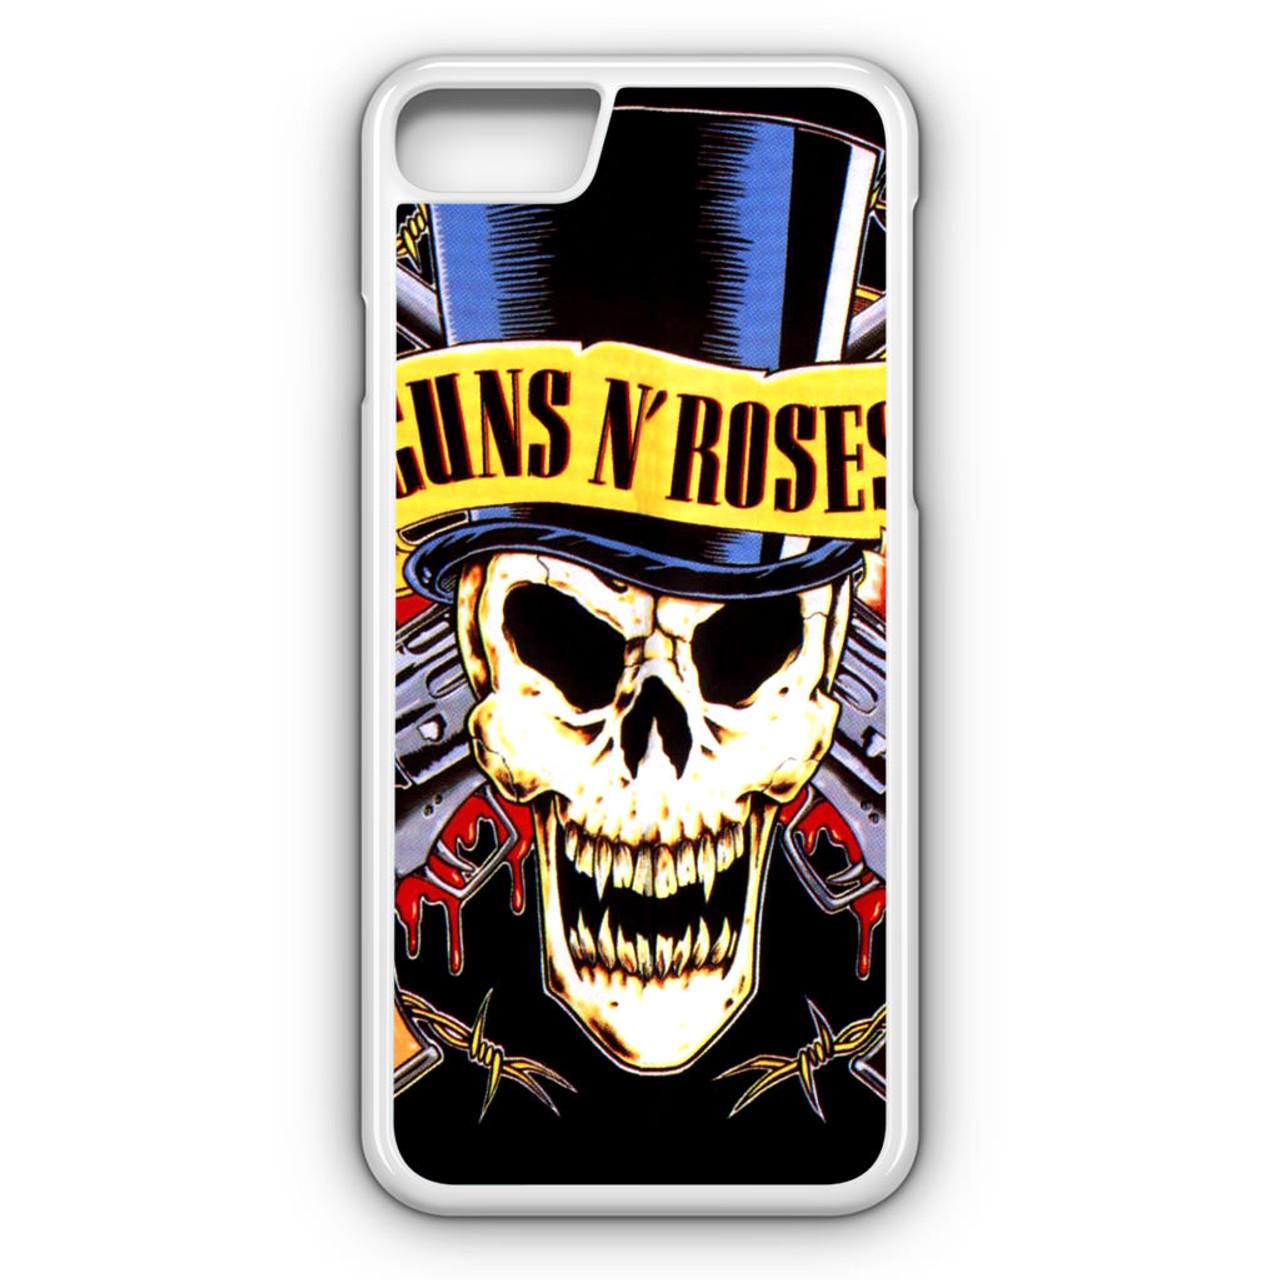 Guns N' Roses iPhone 8 Case